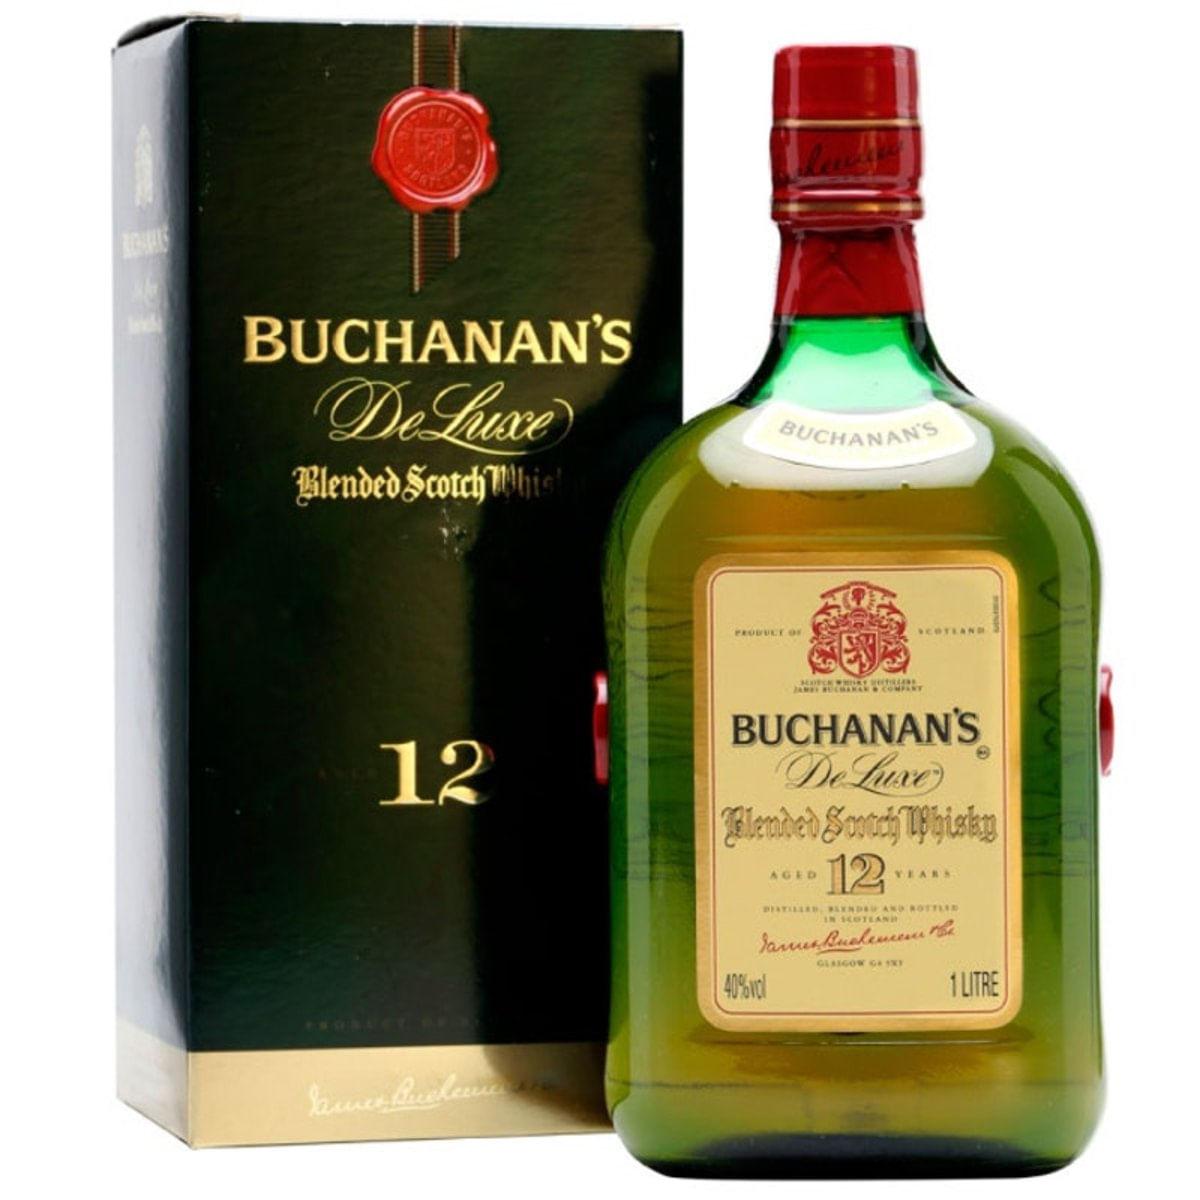 Imagem de Whisky Buchanan's Deluxe 12 Anos 1 Litro